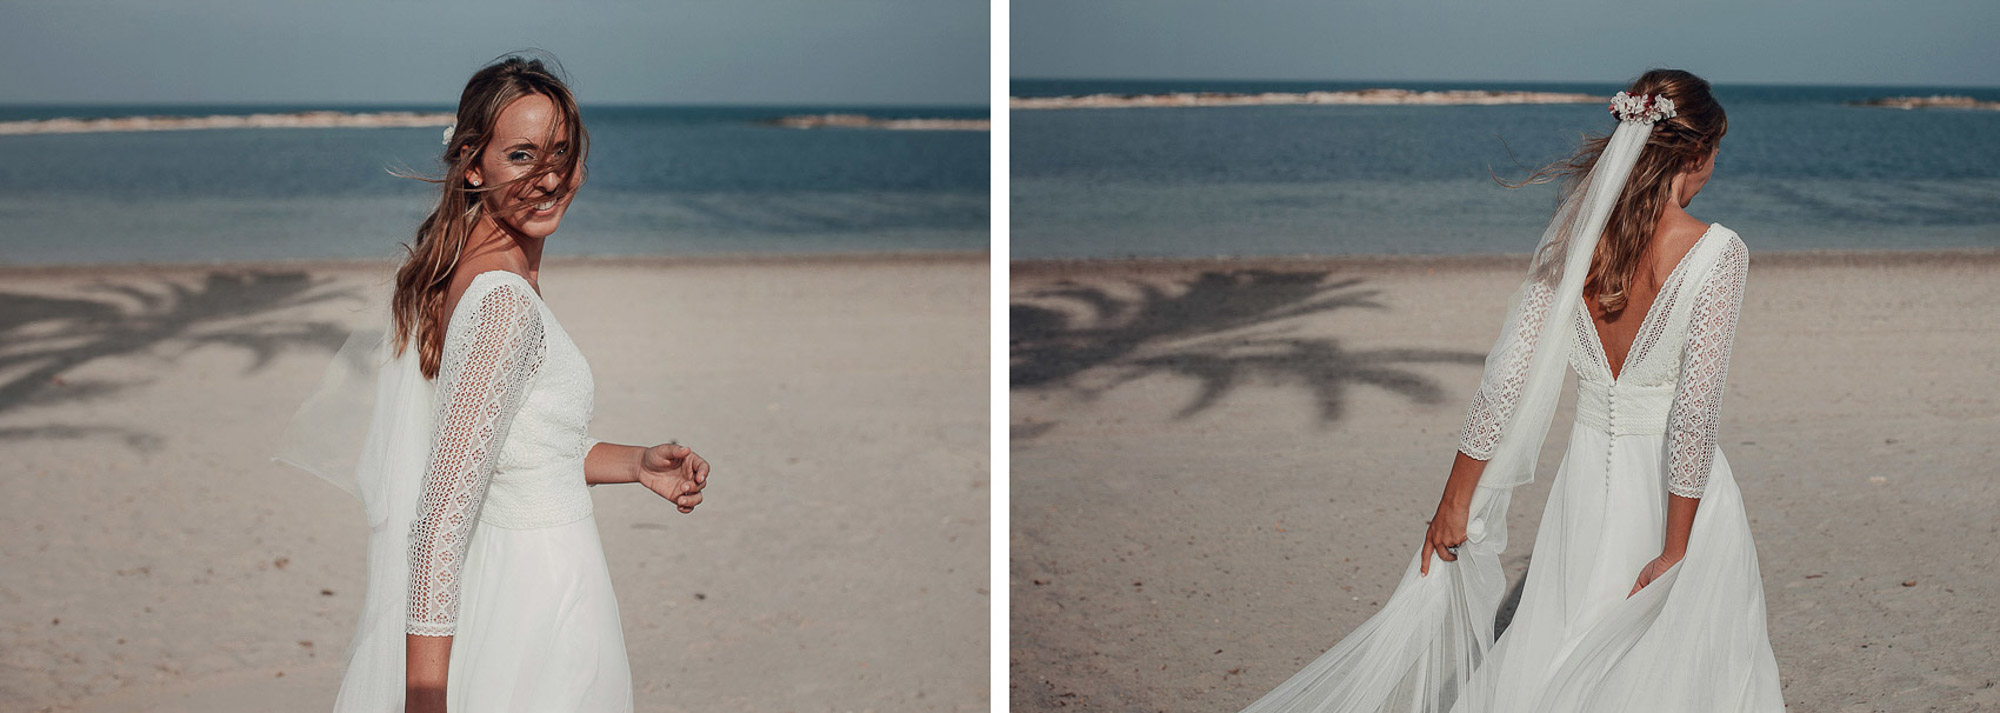 novia vestido playa blanco velo flores detalle cabo de palos fotografia atardecer